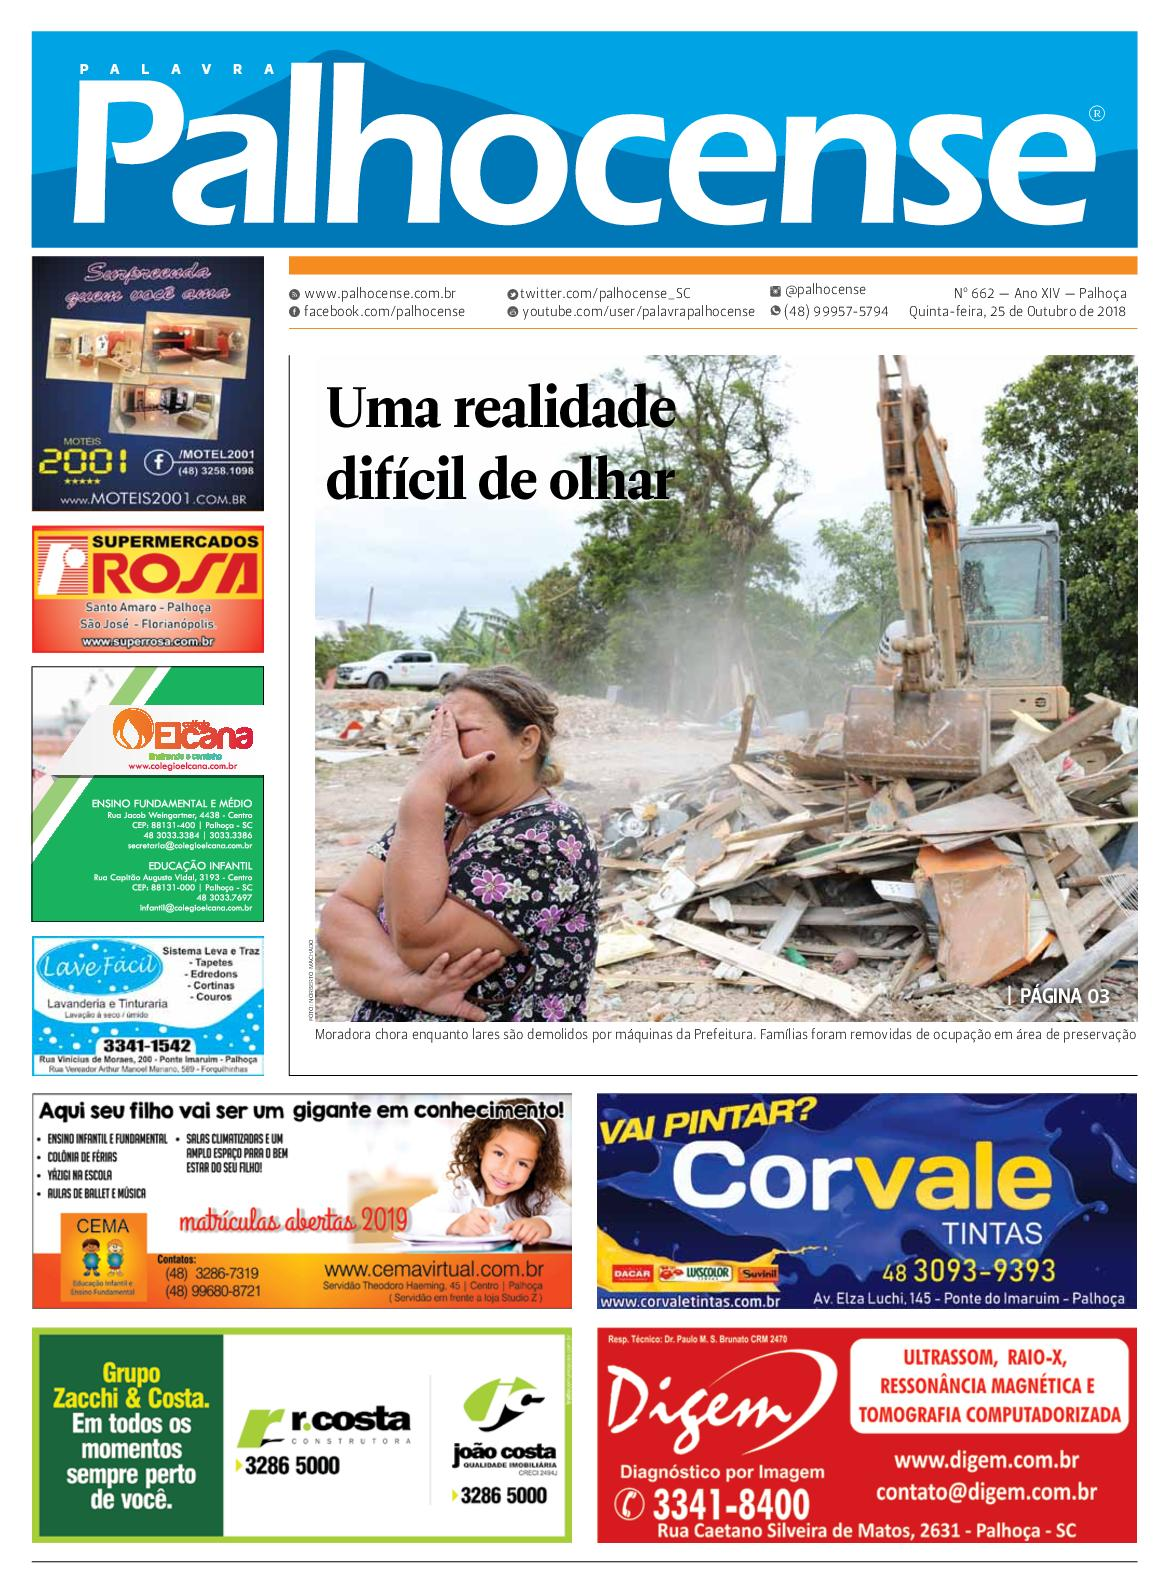 Calaméo - JORNAL PALAVRA PALHOCENSE - EDIÇÃO 662 04be8f0606114